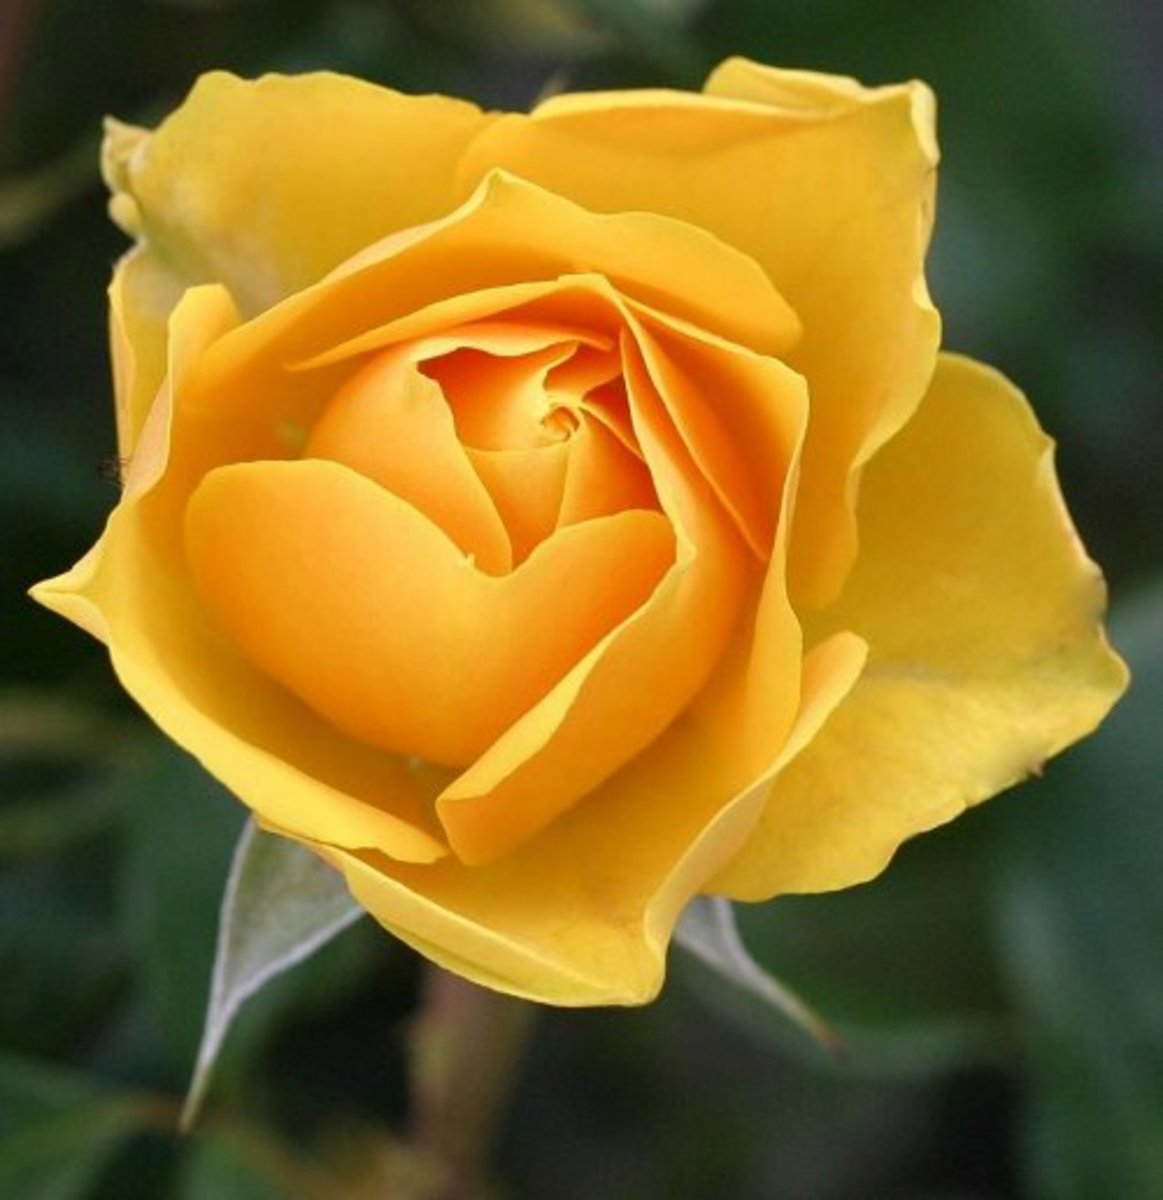 Single golden yellow-orange rose flower.